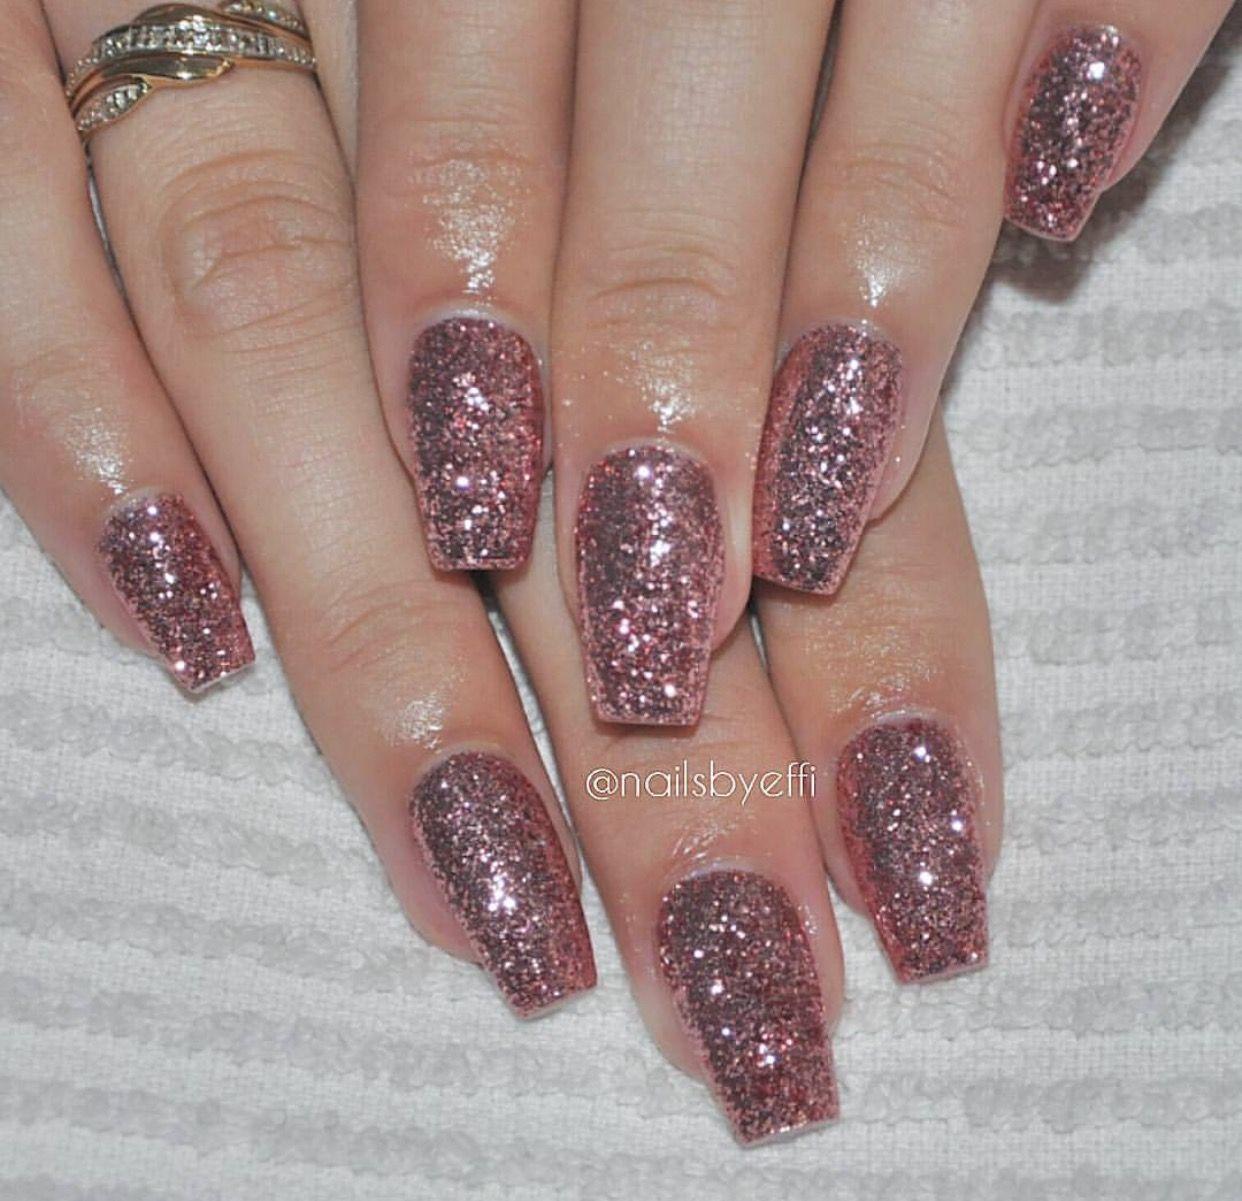 Rose gold glitter | Square & Coffin Nails | Pinterest ...